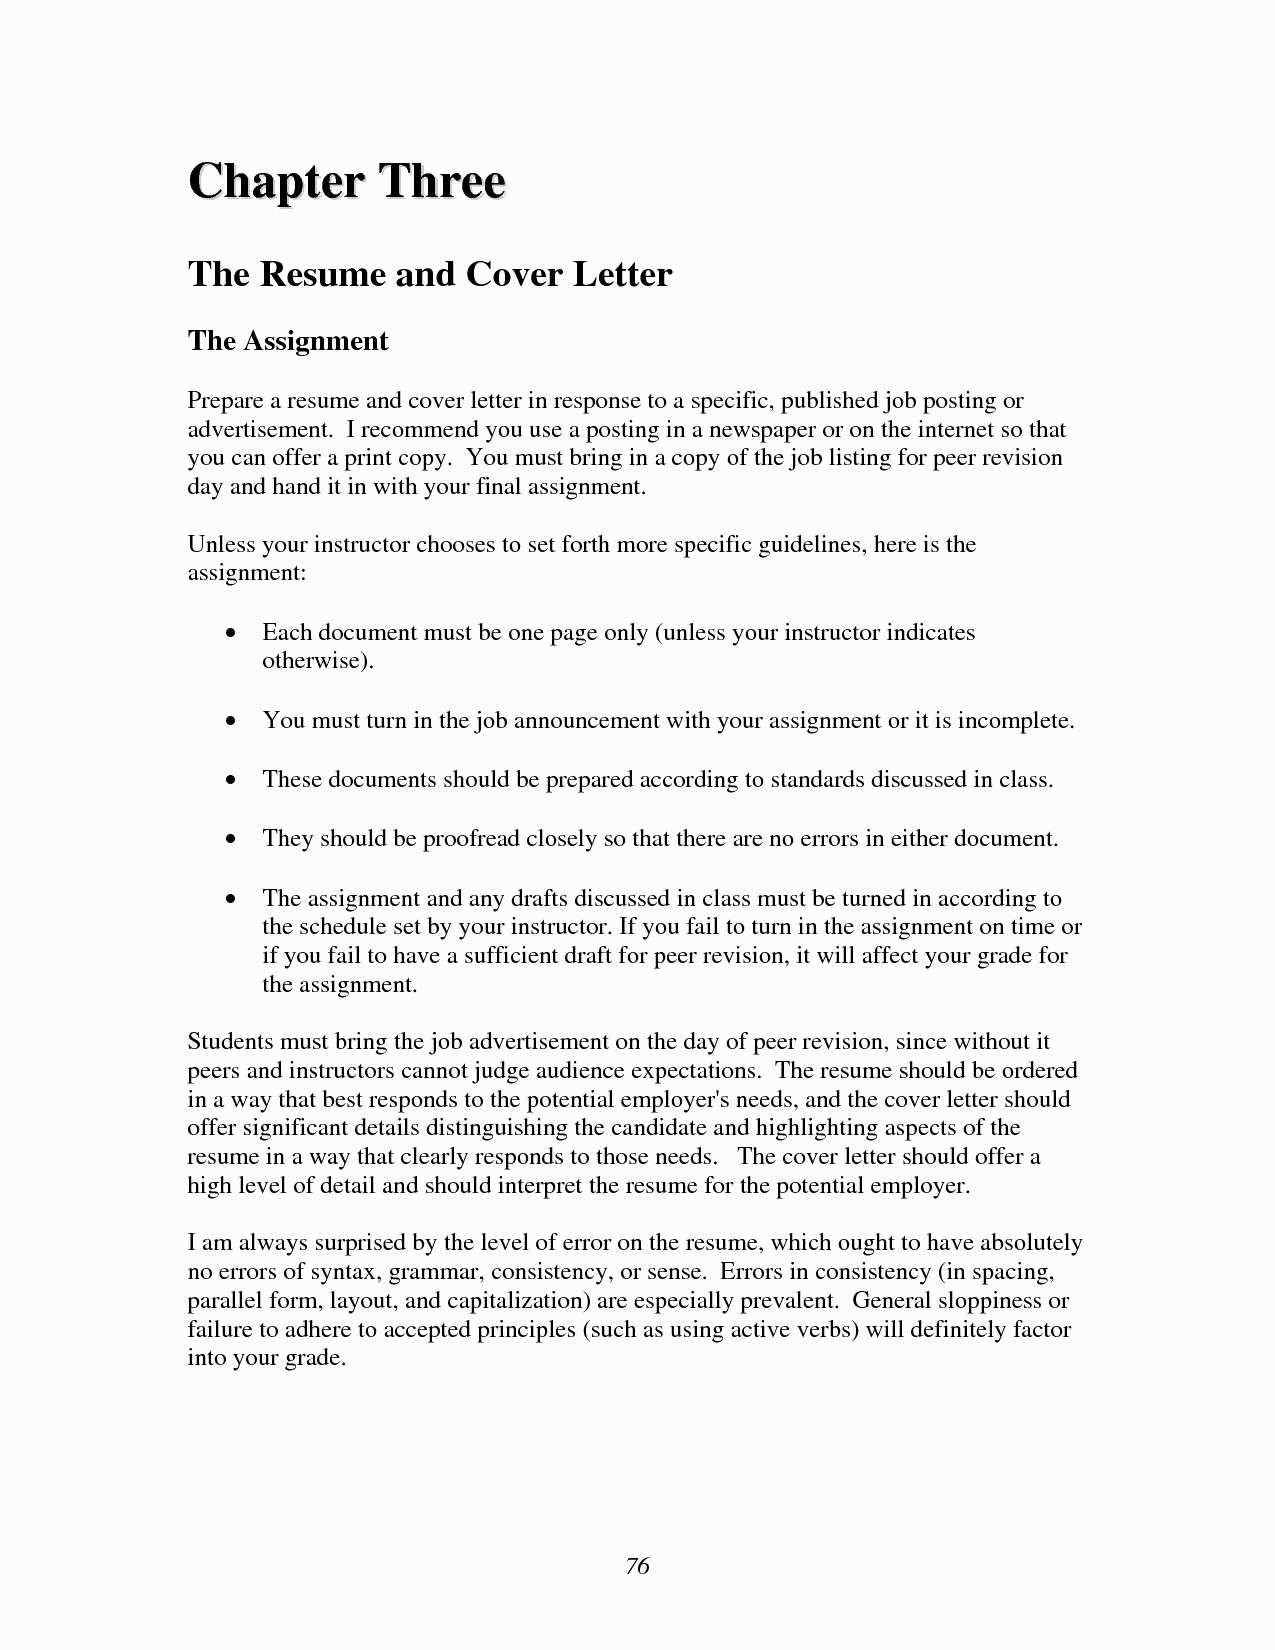 Sample Cover Letter Template - Sample Cover Letters for A Job Inspirationa Job Fer Letter Template